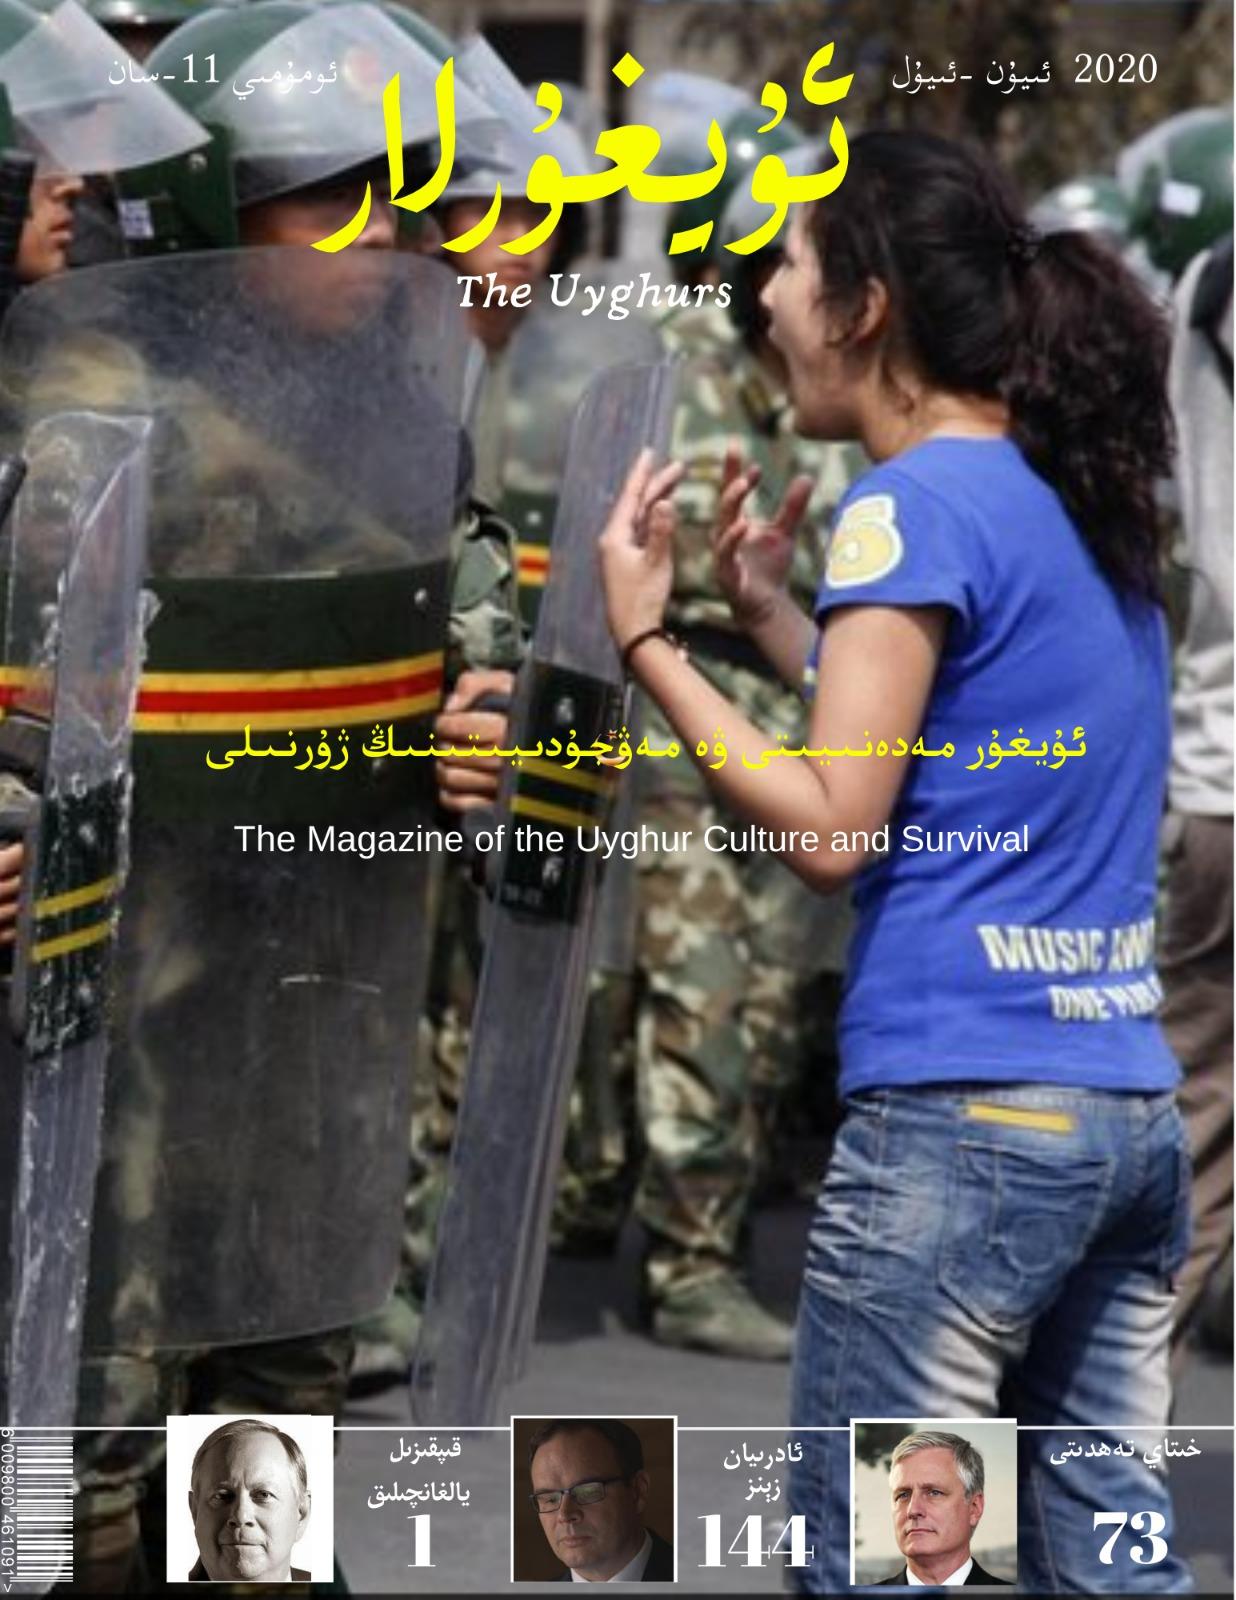 Uyghur11 - ئۇيغۇرلار 2020-يىلى 11-سان